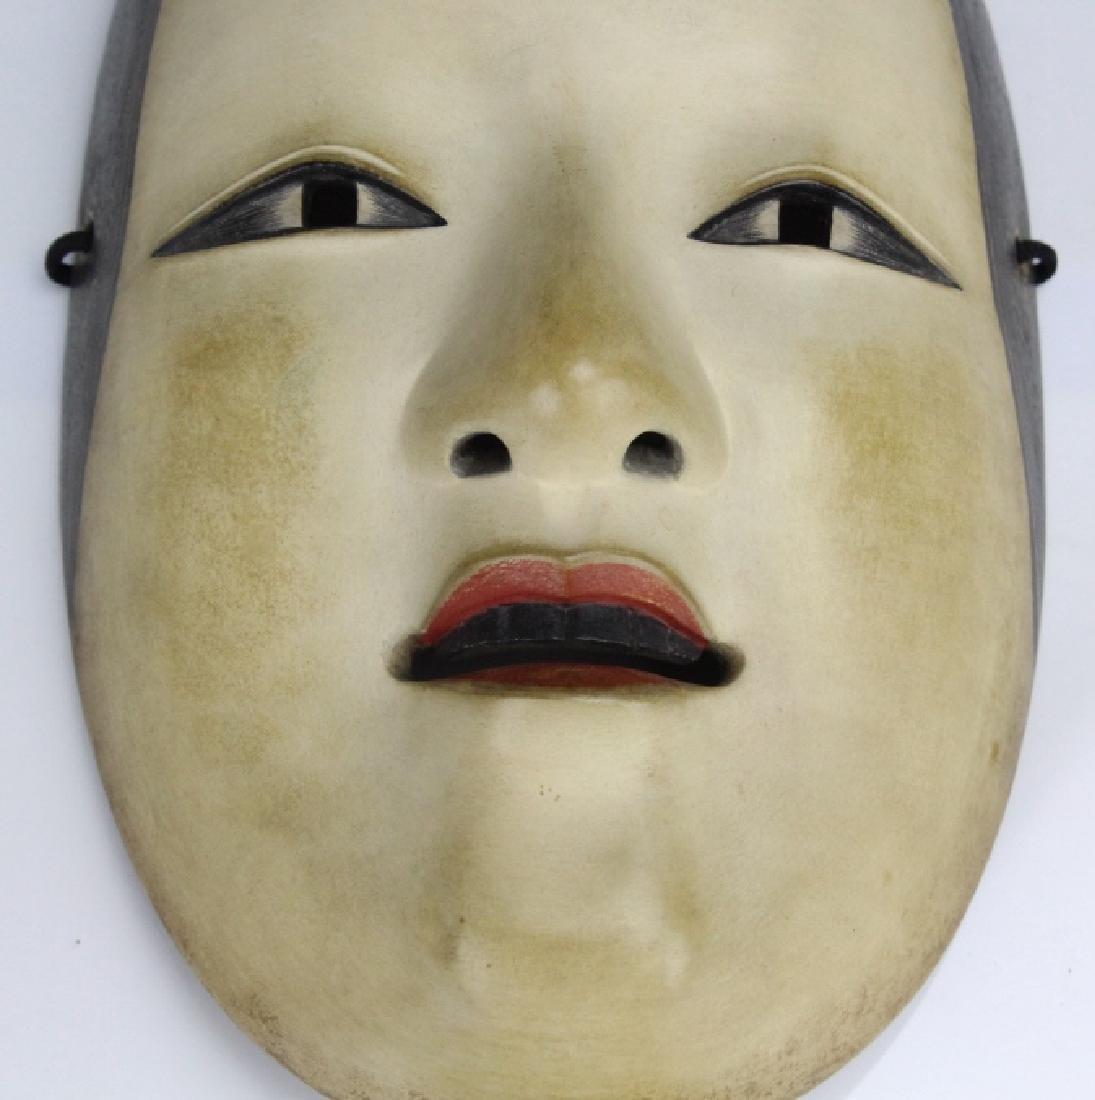 Ko-Omote Japanese Theater No Mask by Manzo Nomura - 2